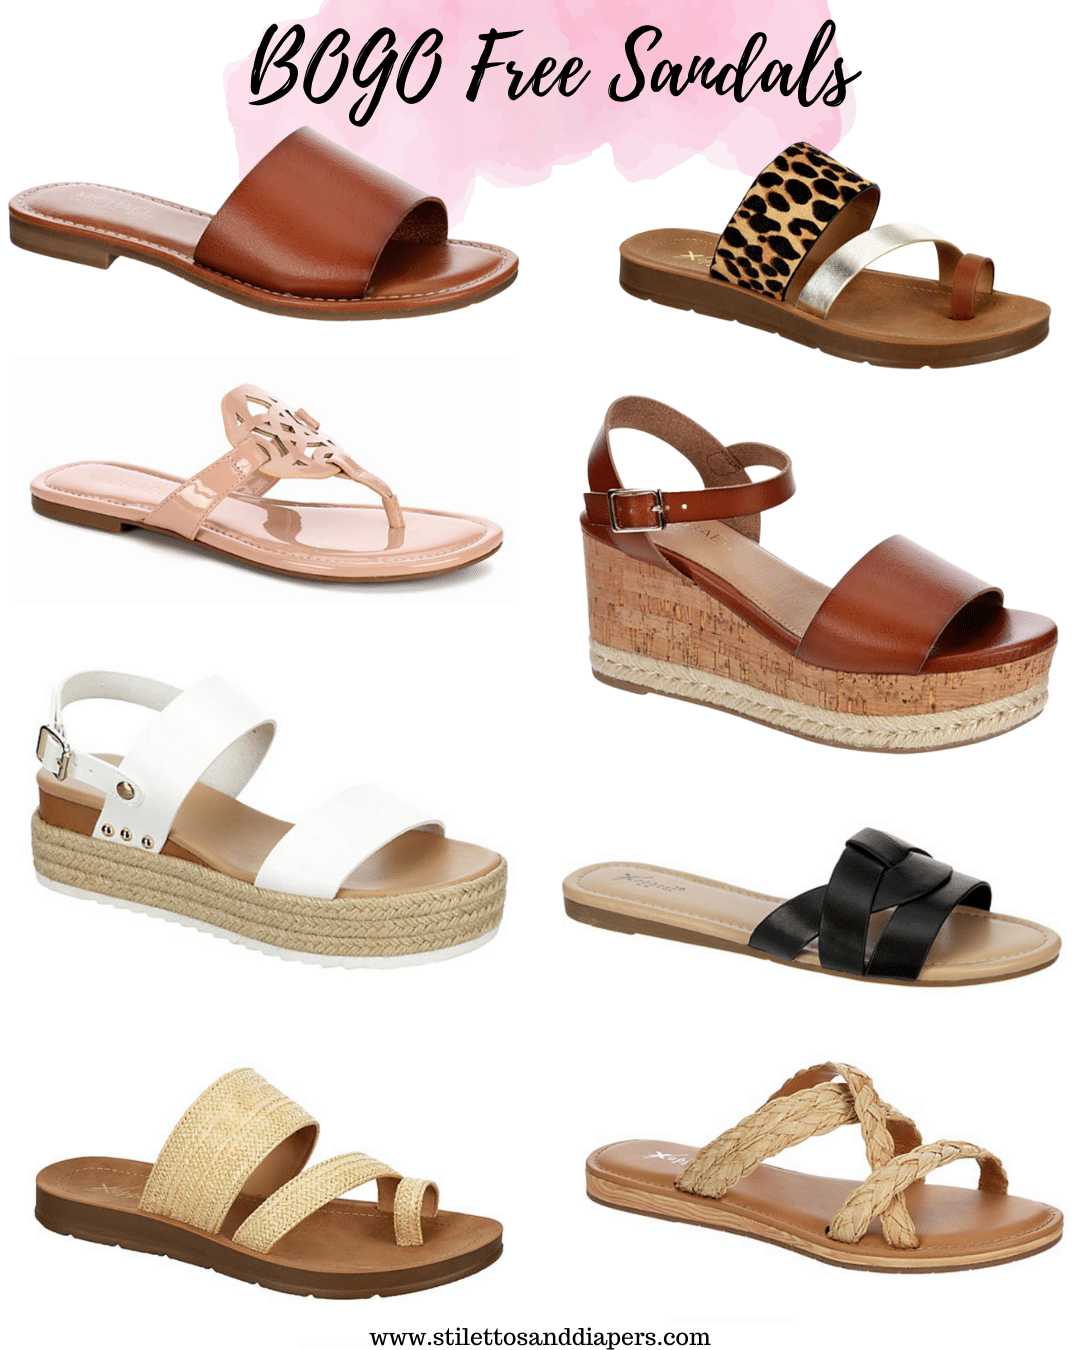 BOGO Free Sandals for the family